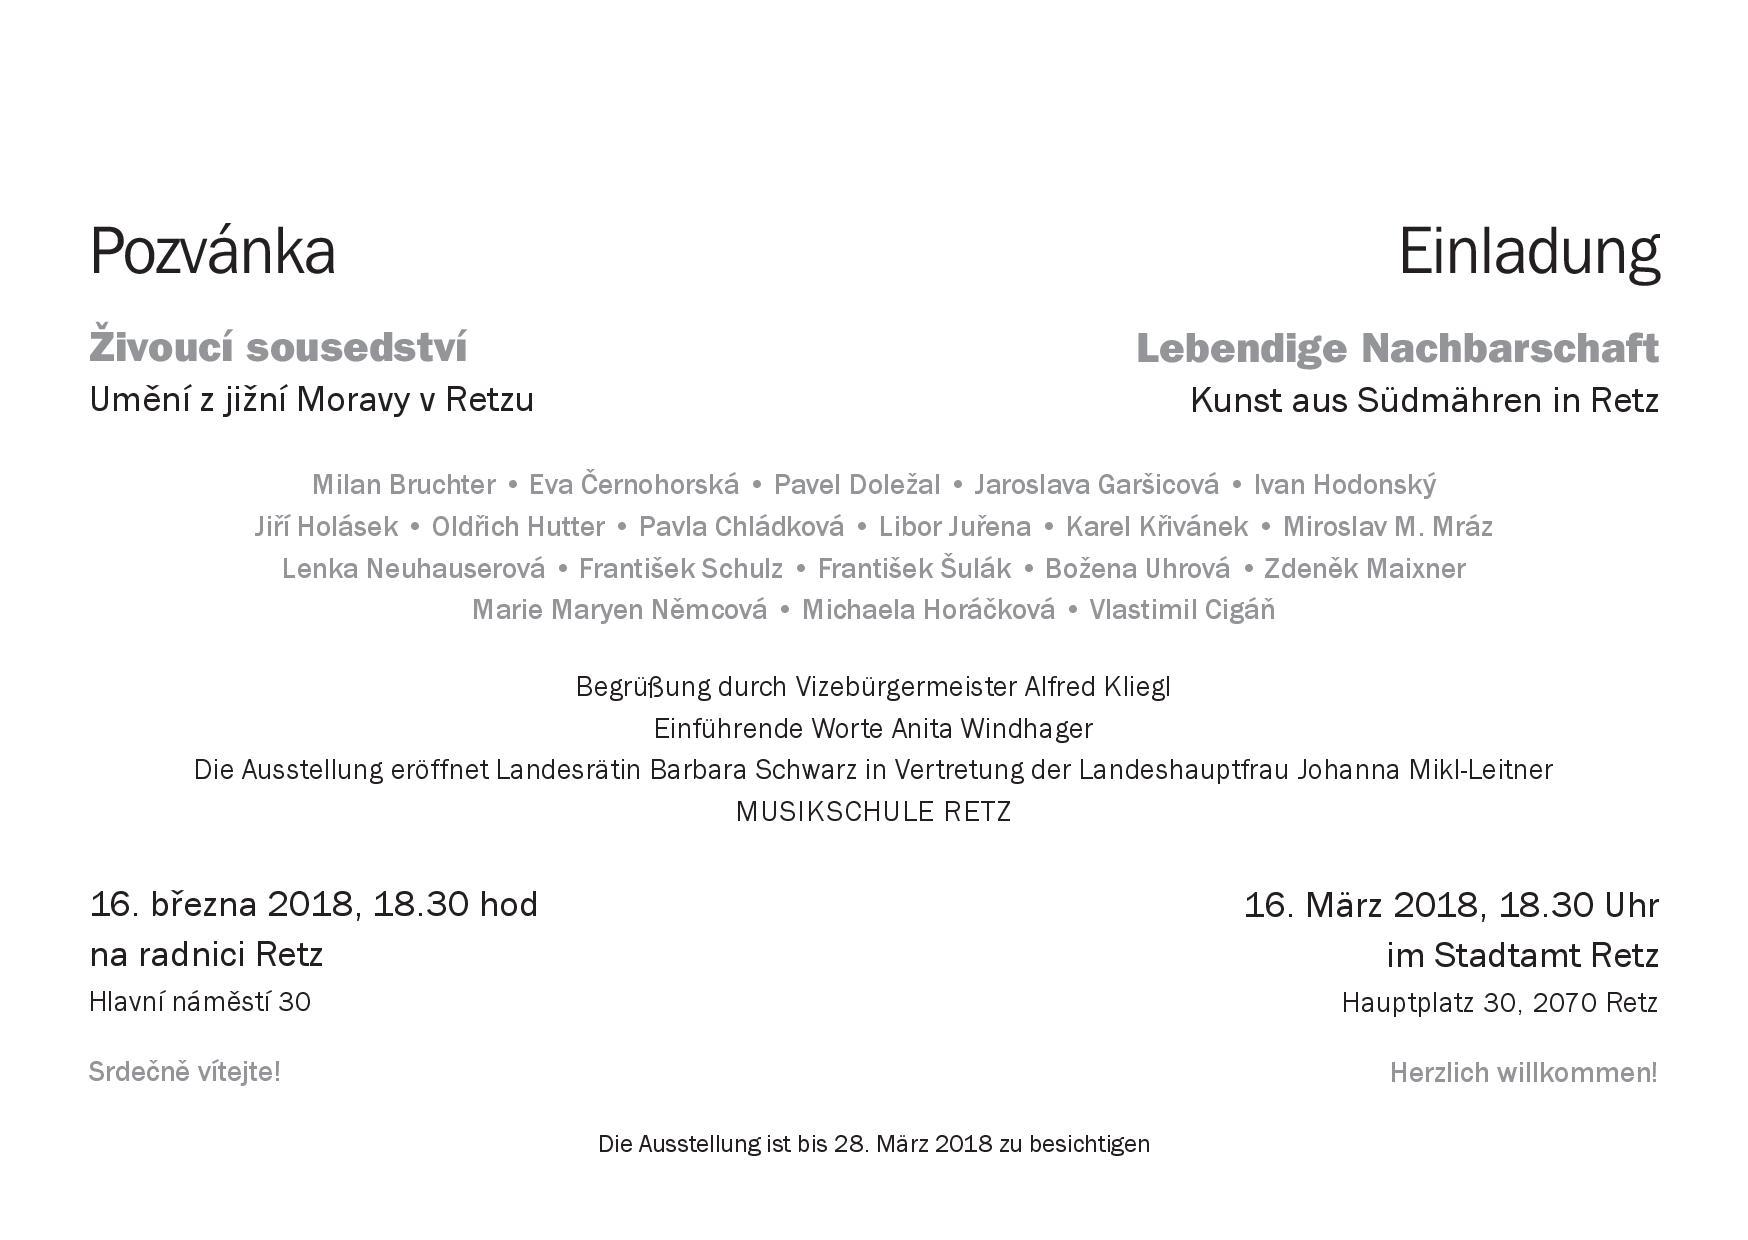 Retz_pozvánka-page-002.jpg